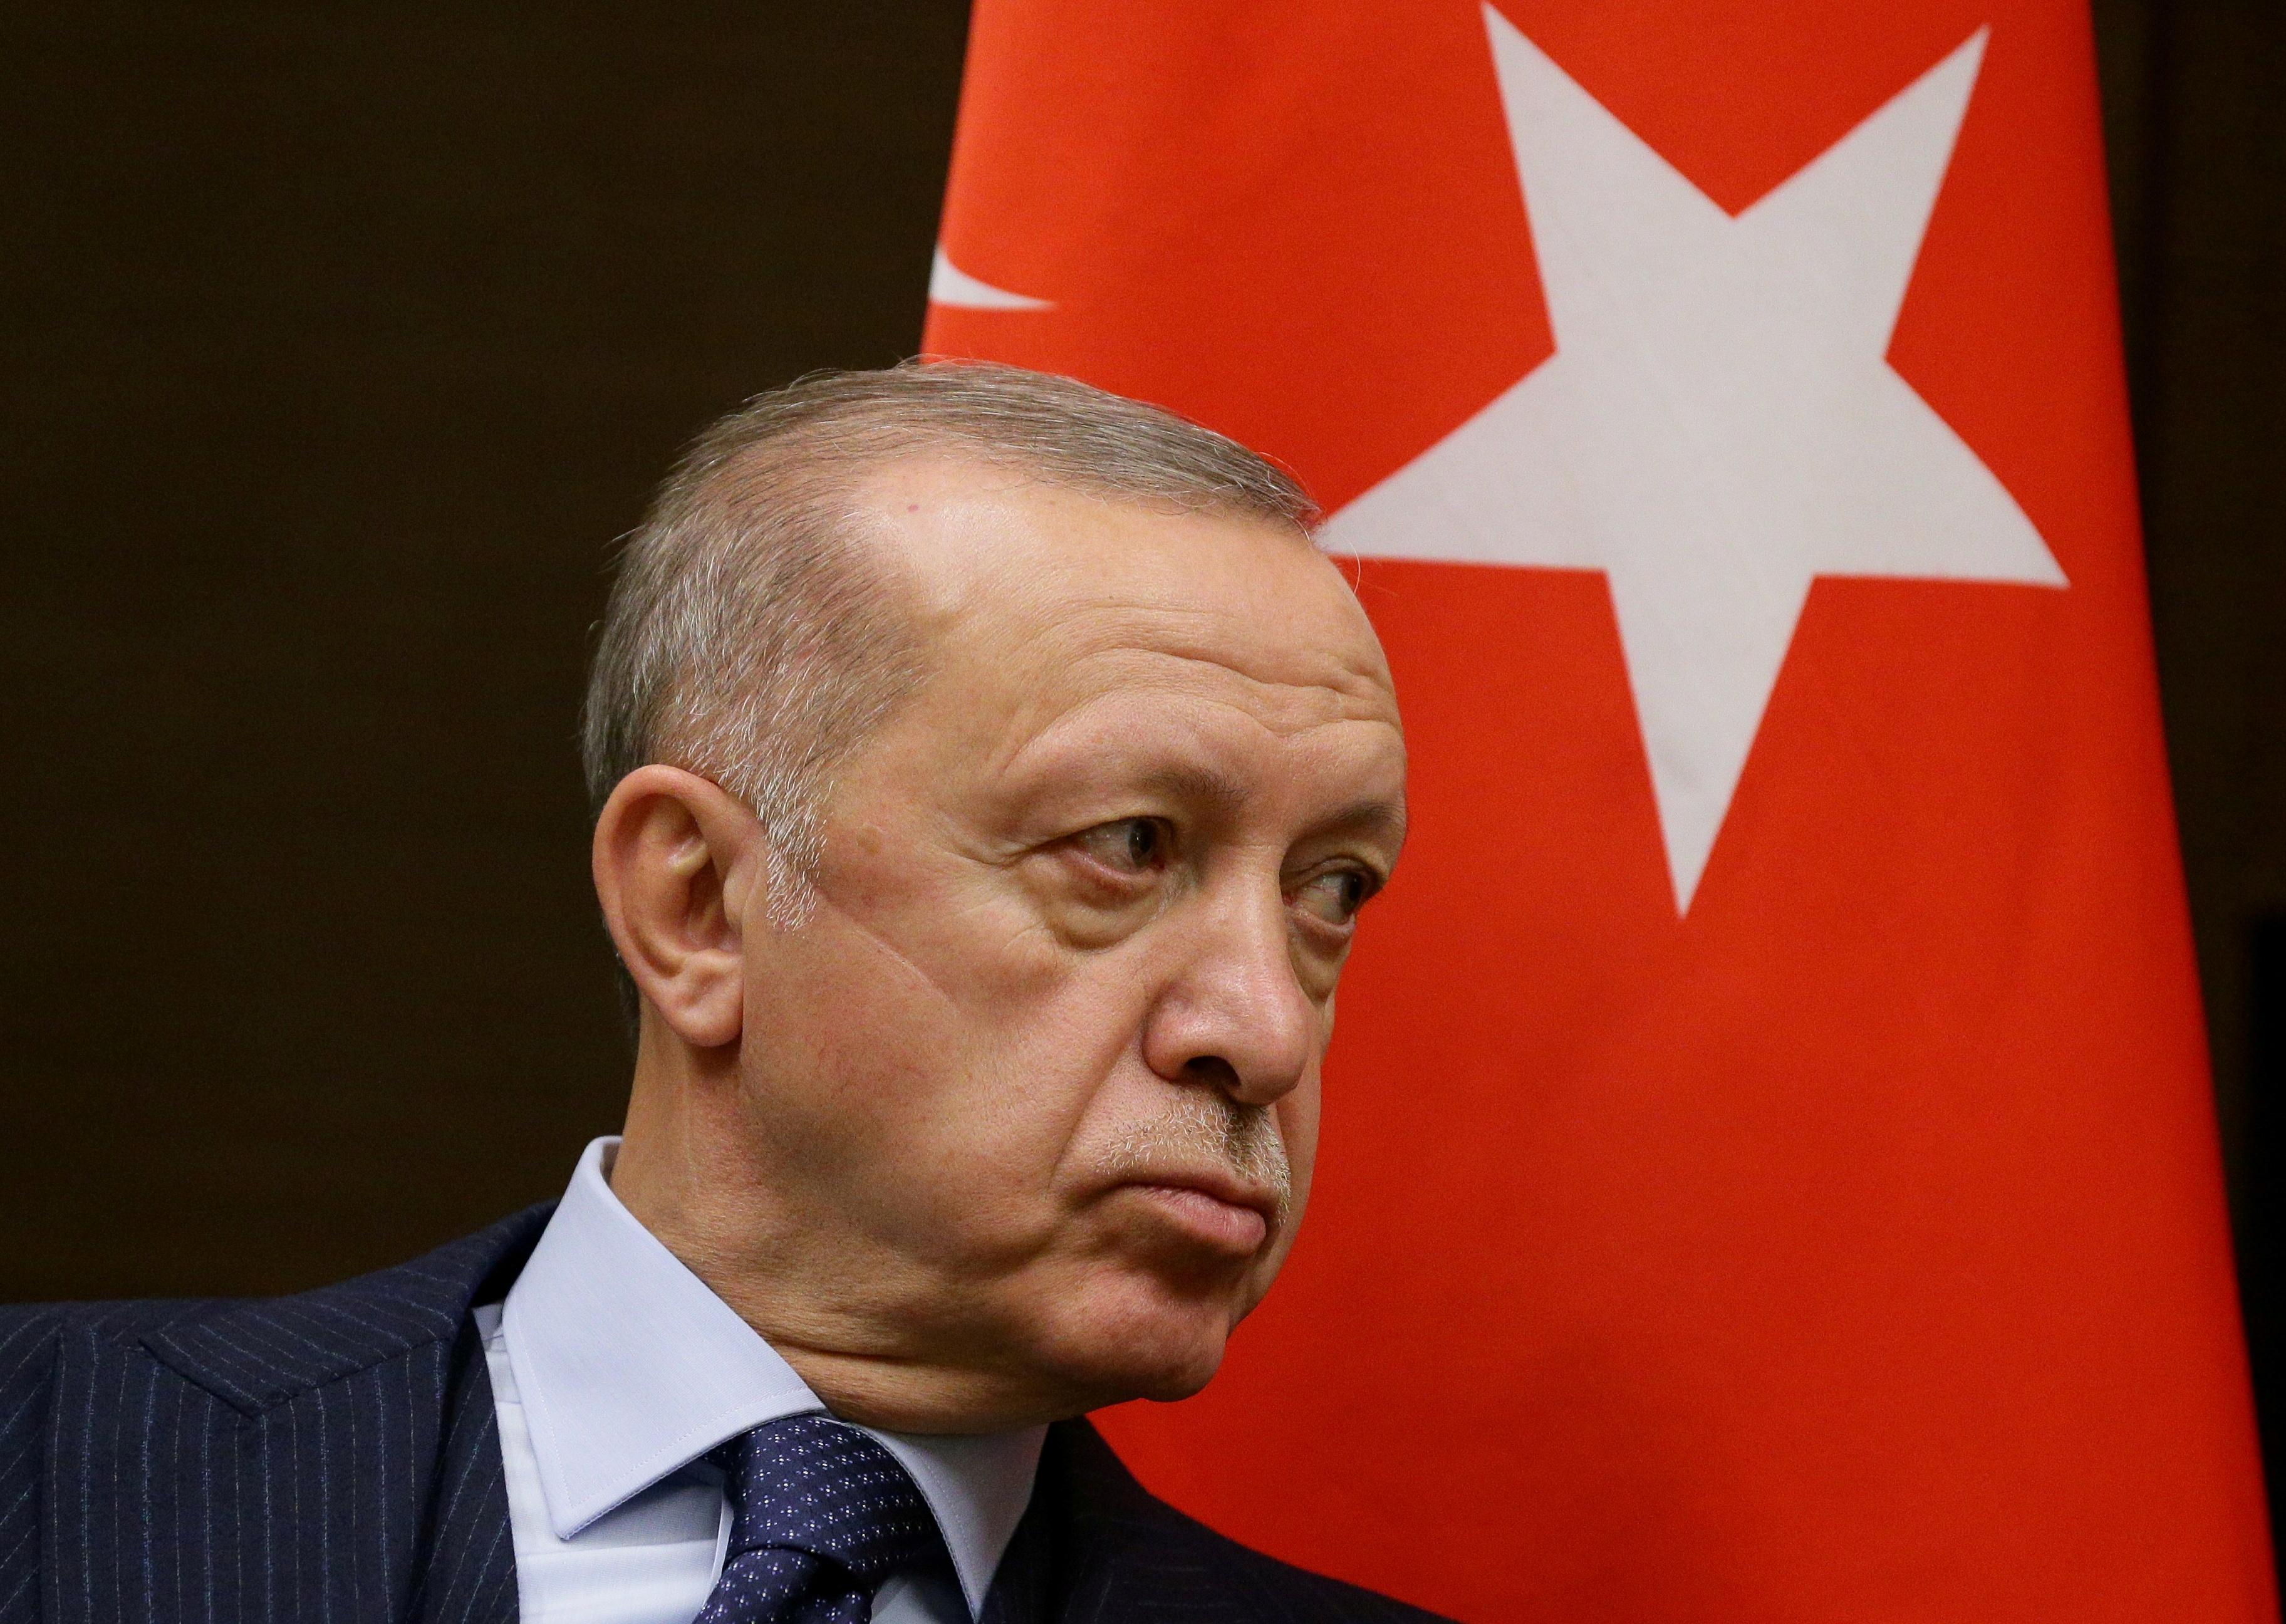 Turkish President Tayyip Erdogan in Sochi, Russia September 29, 2021. Sputnik/Vladimir Smirnov/Pool via REUTERS